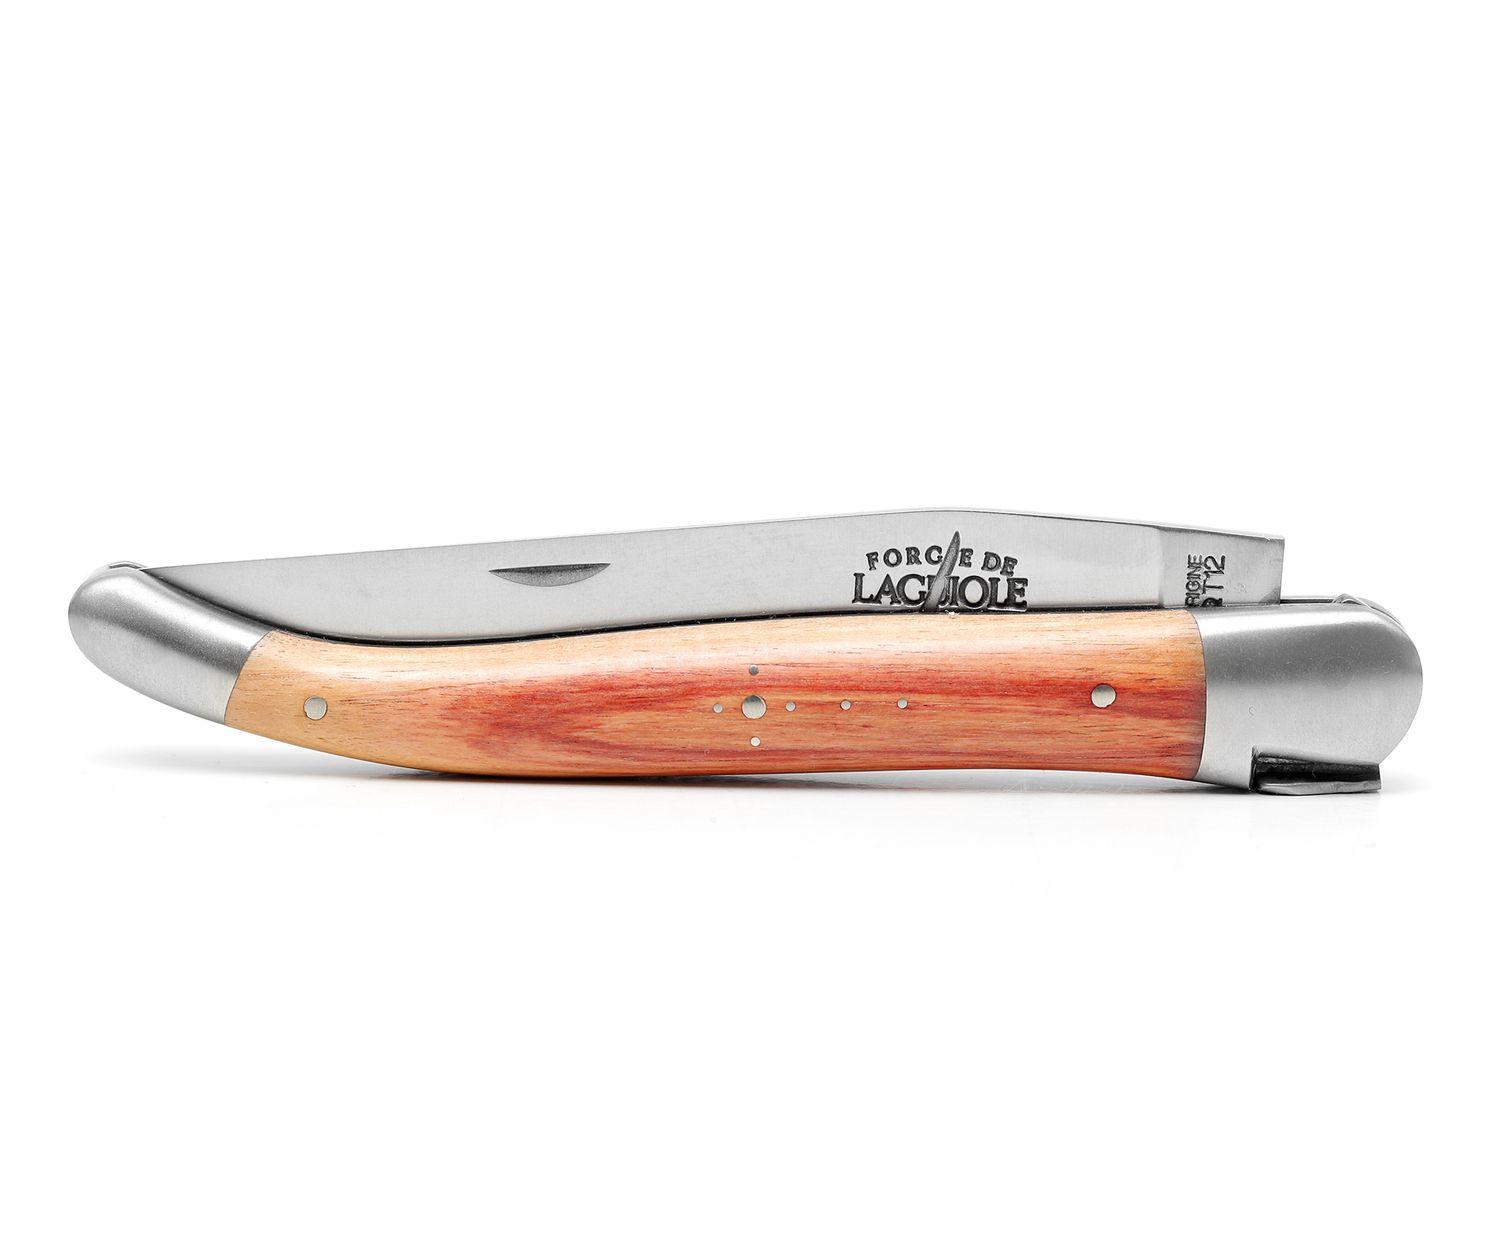 Forge de Laguiole Taschenmesser 12 cm, Rosenholz – Bild 2